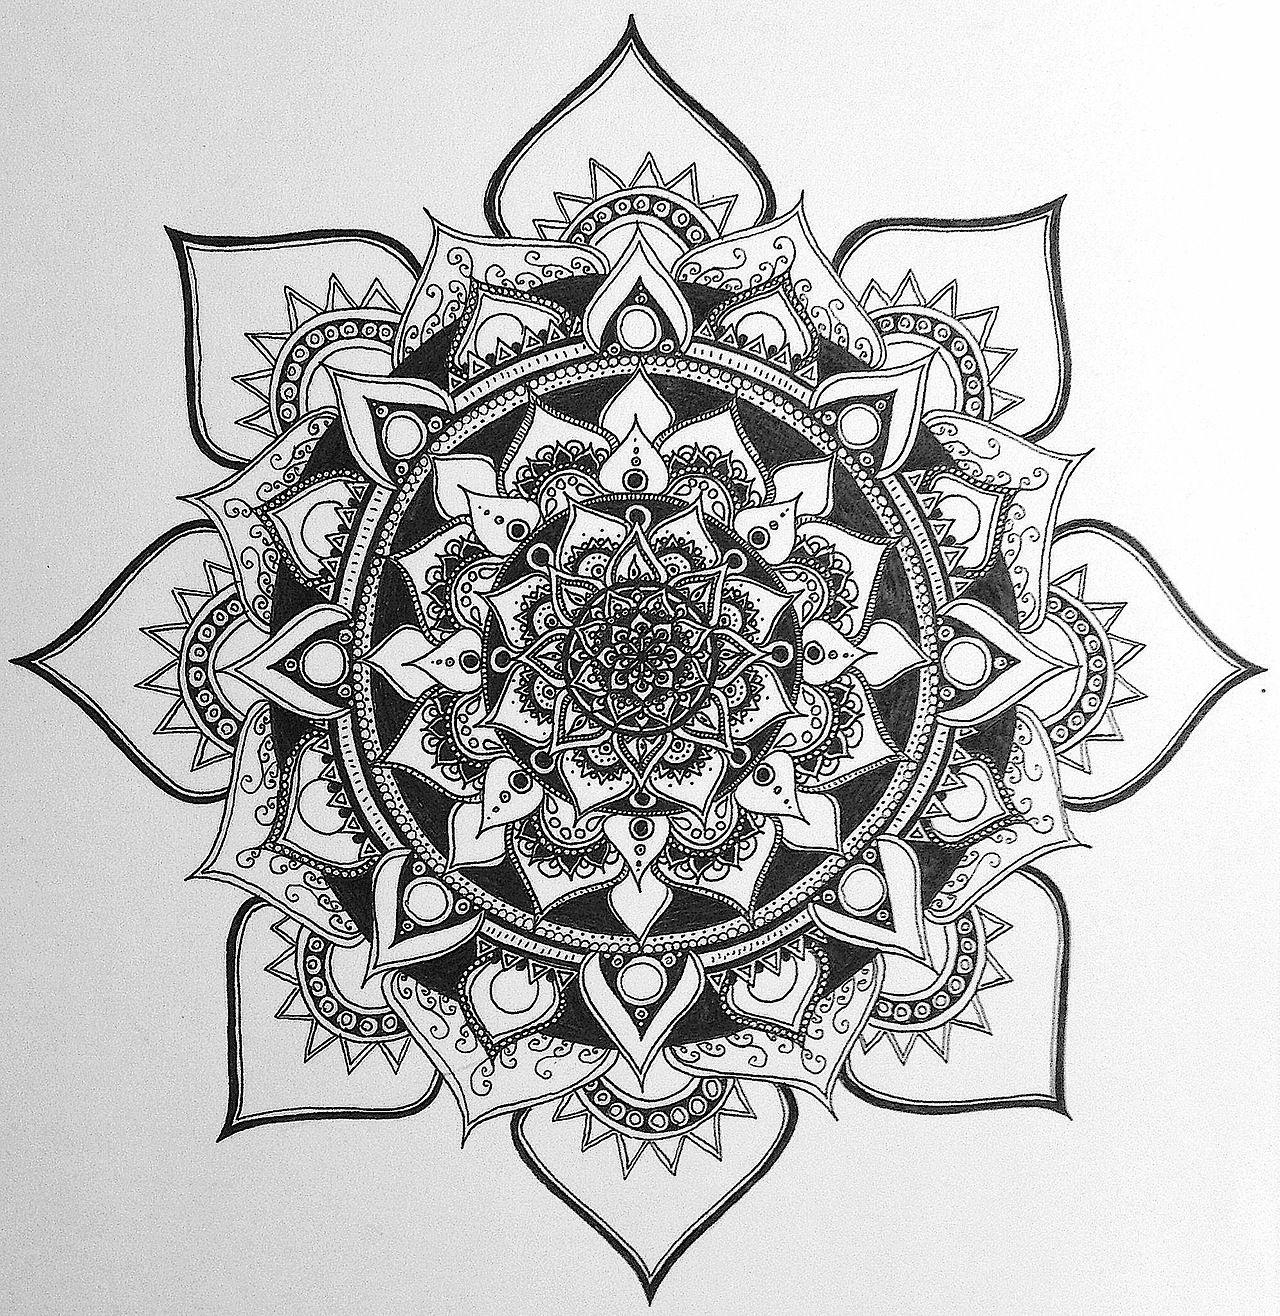 Mandala Tattoo Design On Pinterest: Mandala Designs, Harborinthestorm: This May Or May Not Be